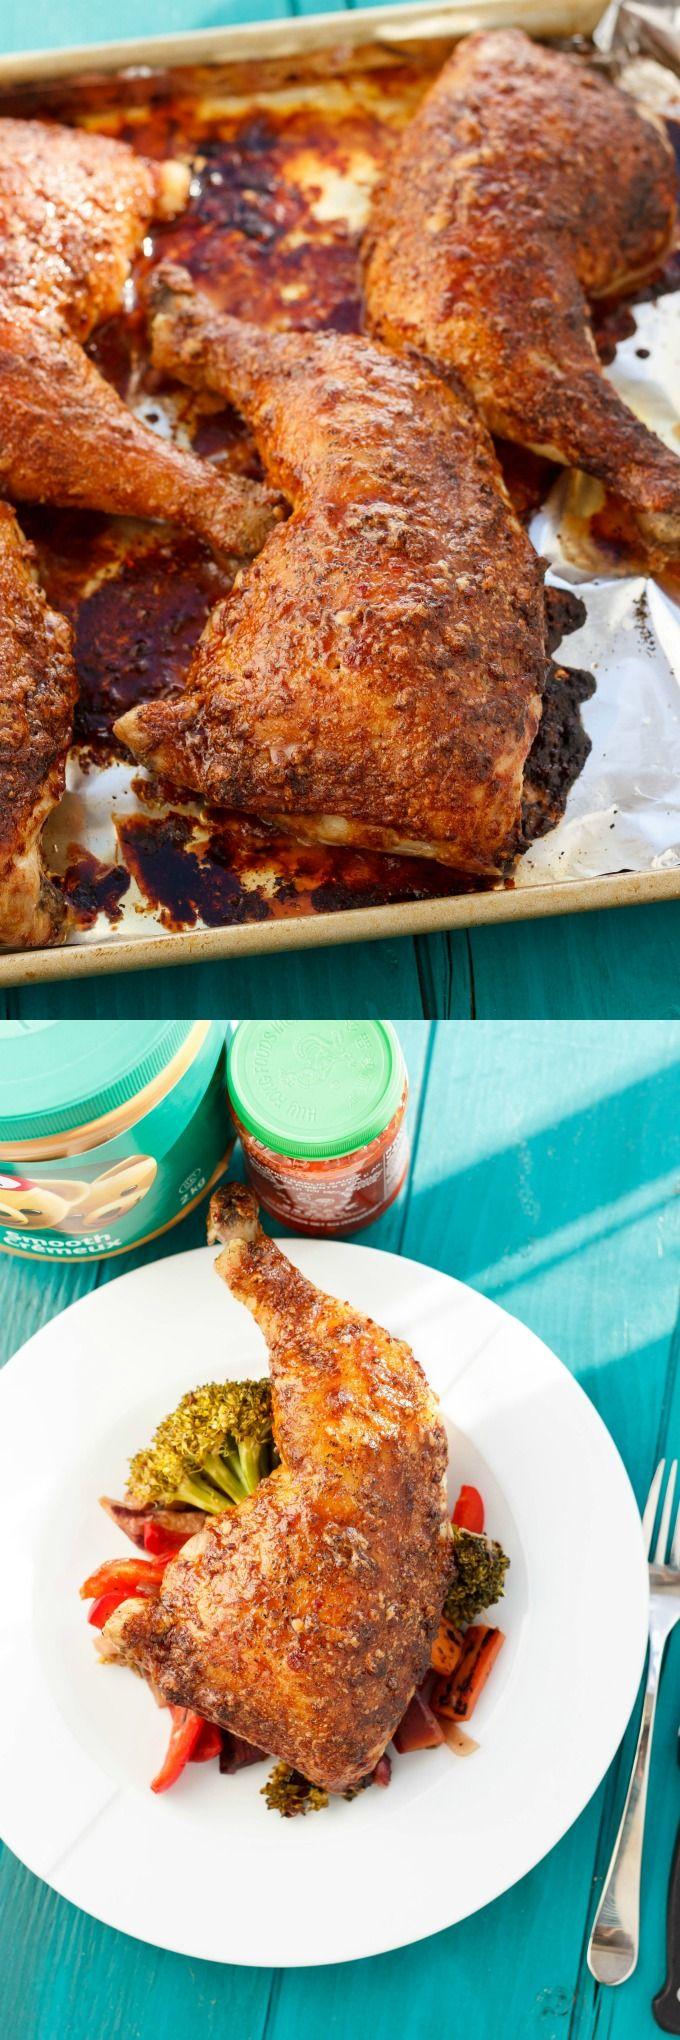 Asian Inspired Chicken Leg Quarters   #dinner #peanutbutter #chicken   http://thecookiewriter.com